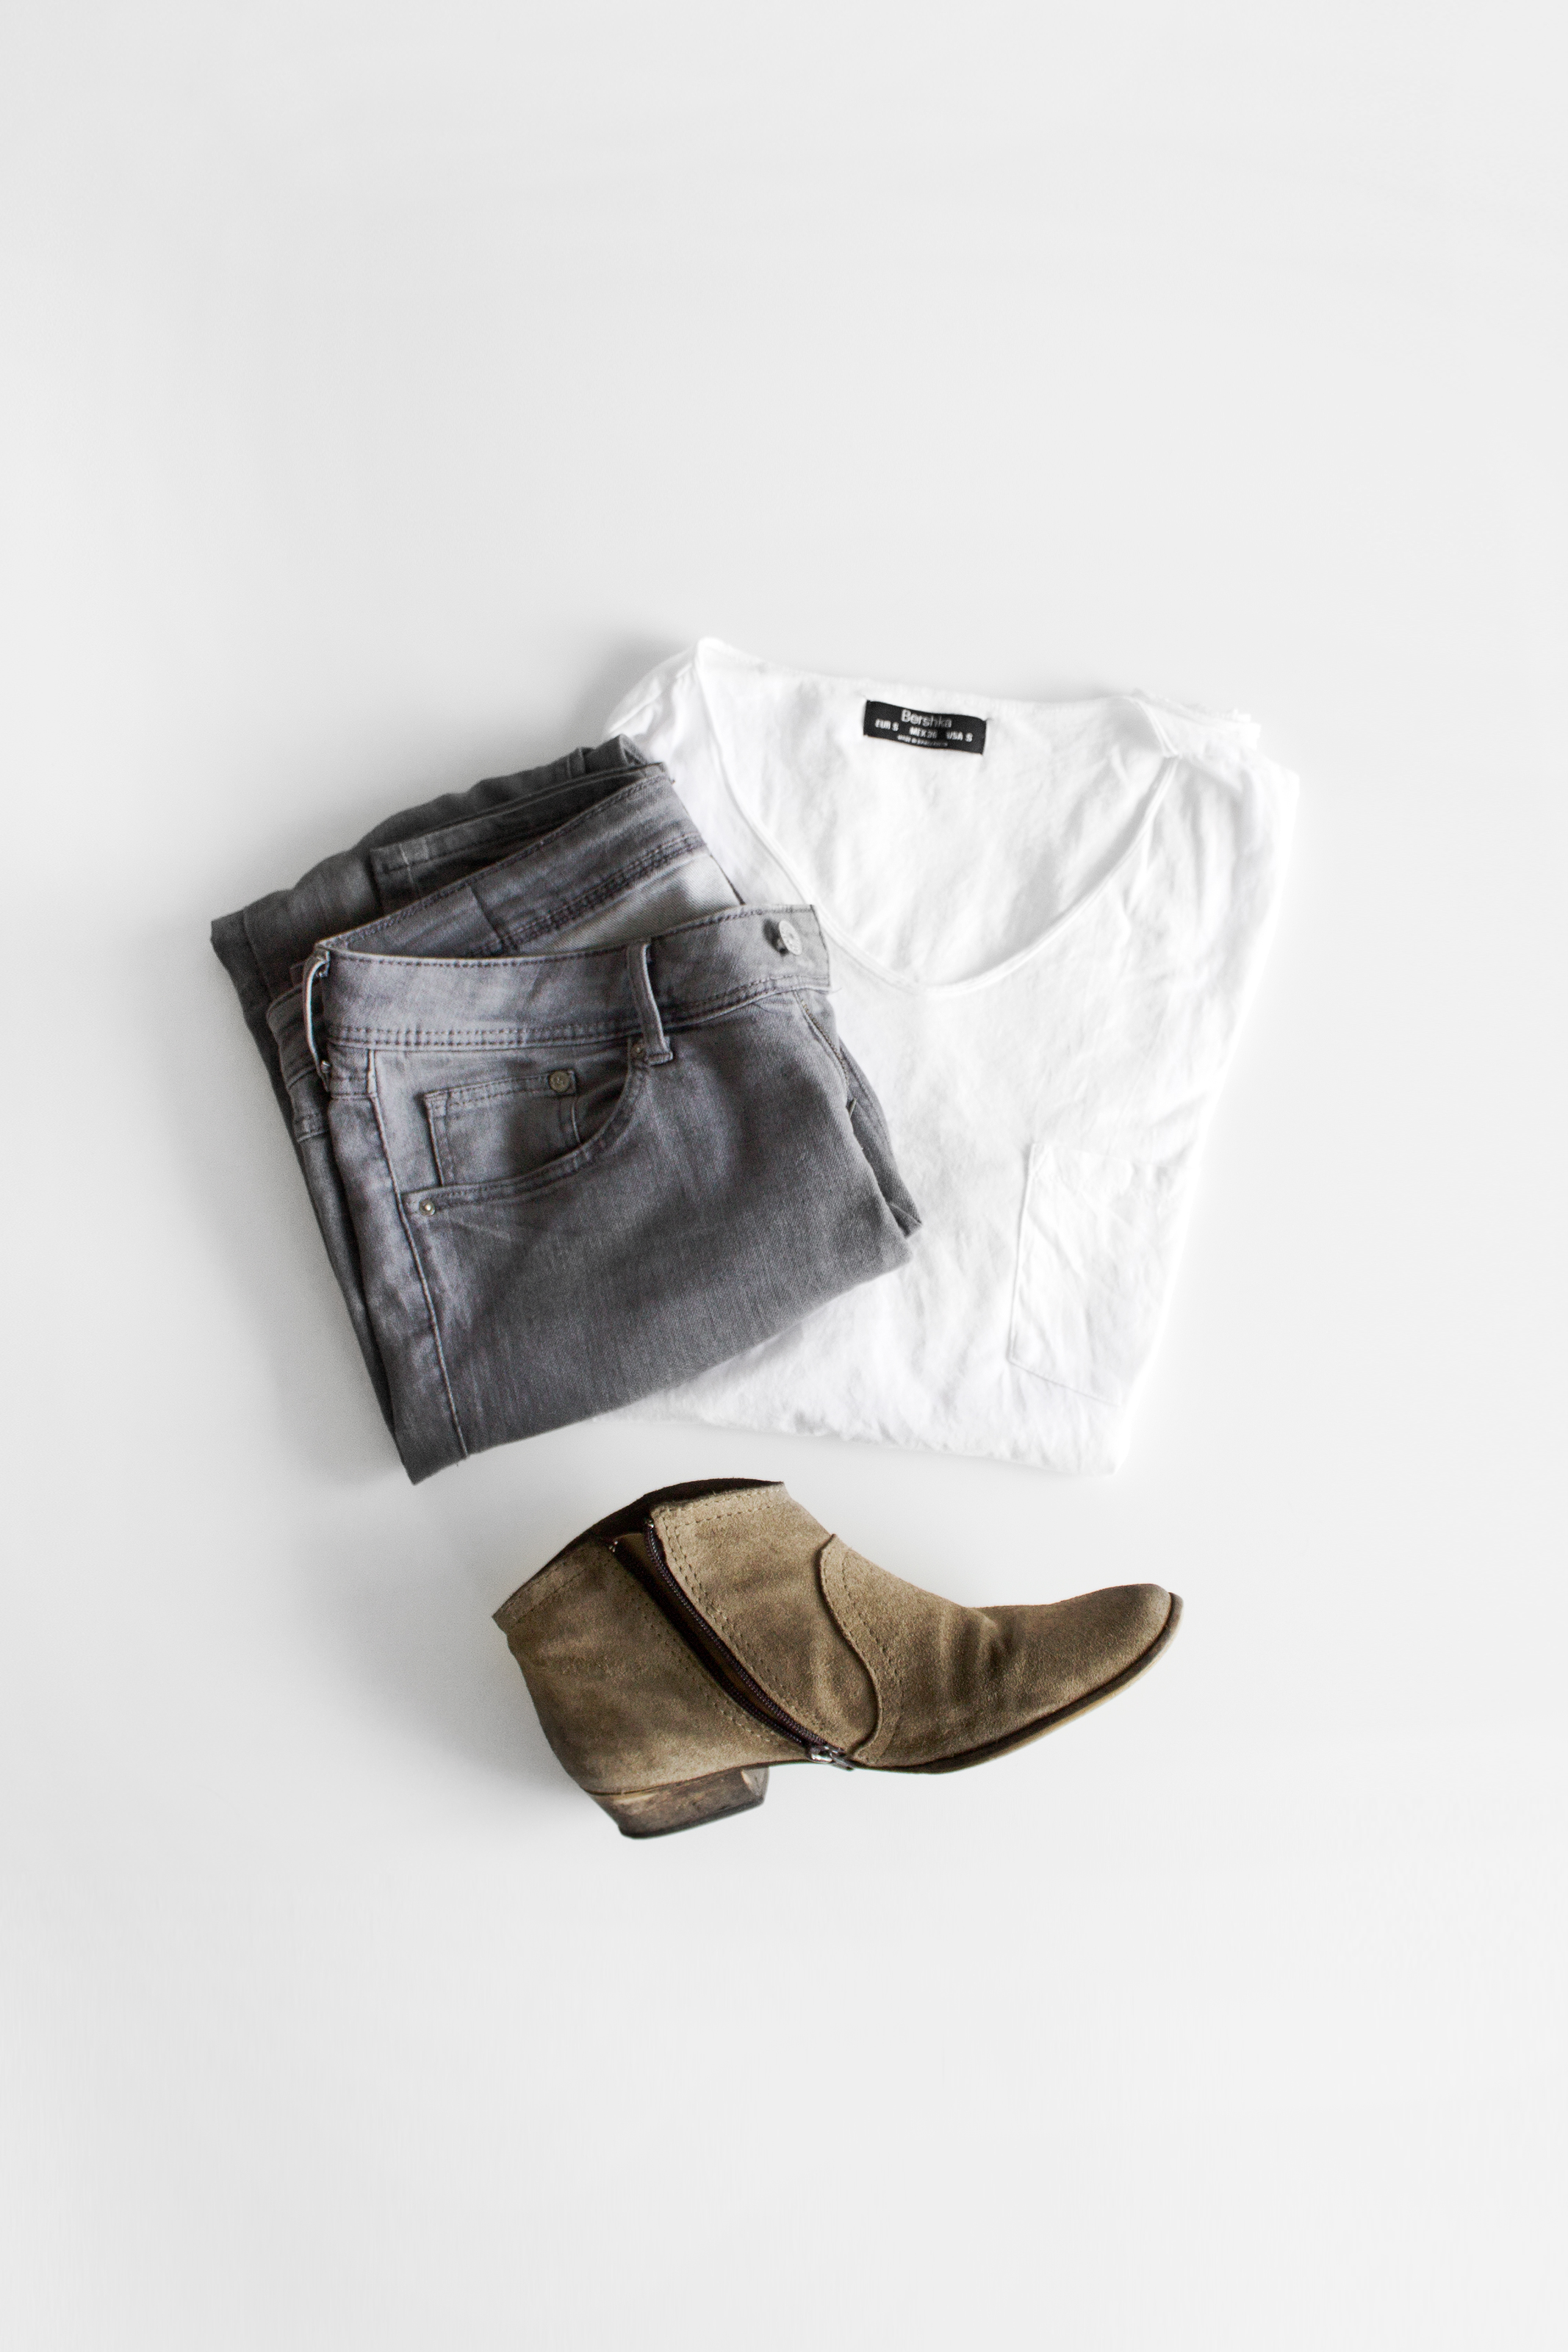 simple-closet-slco.jpg